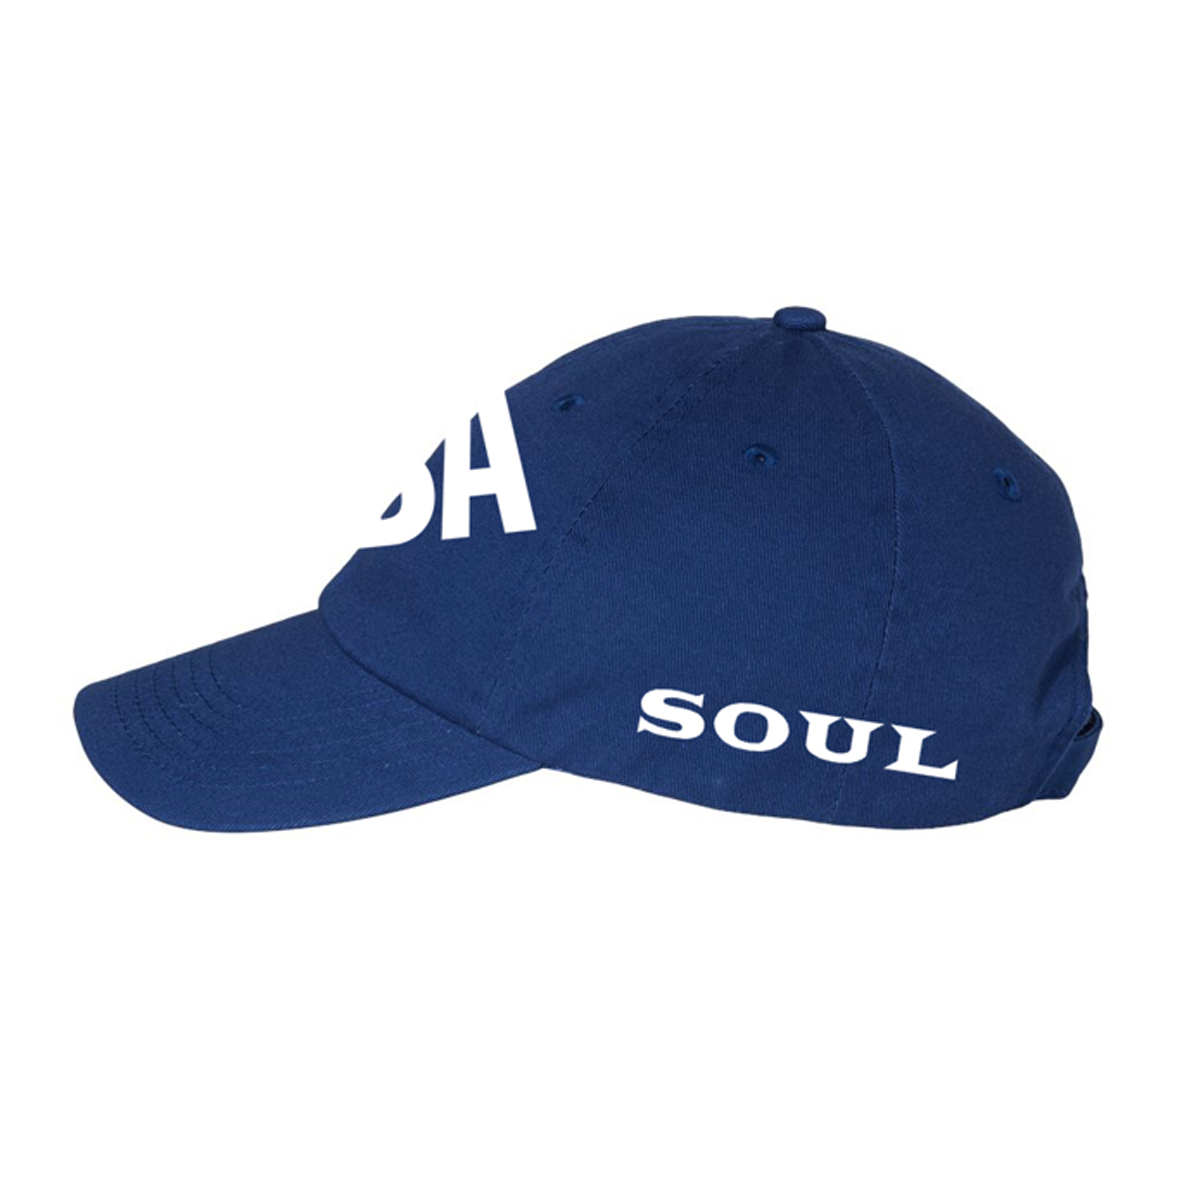 Soul Dream Hat & Nalgene Bundle